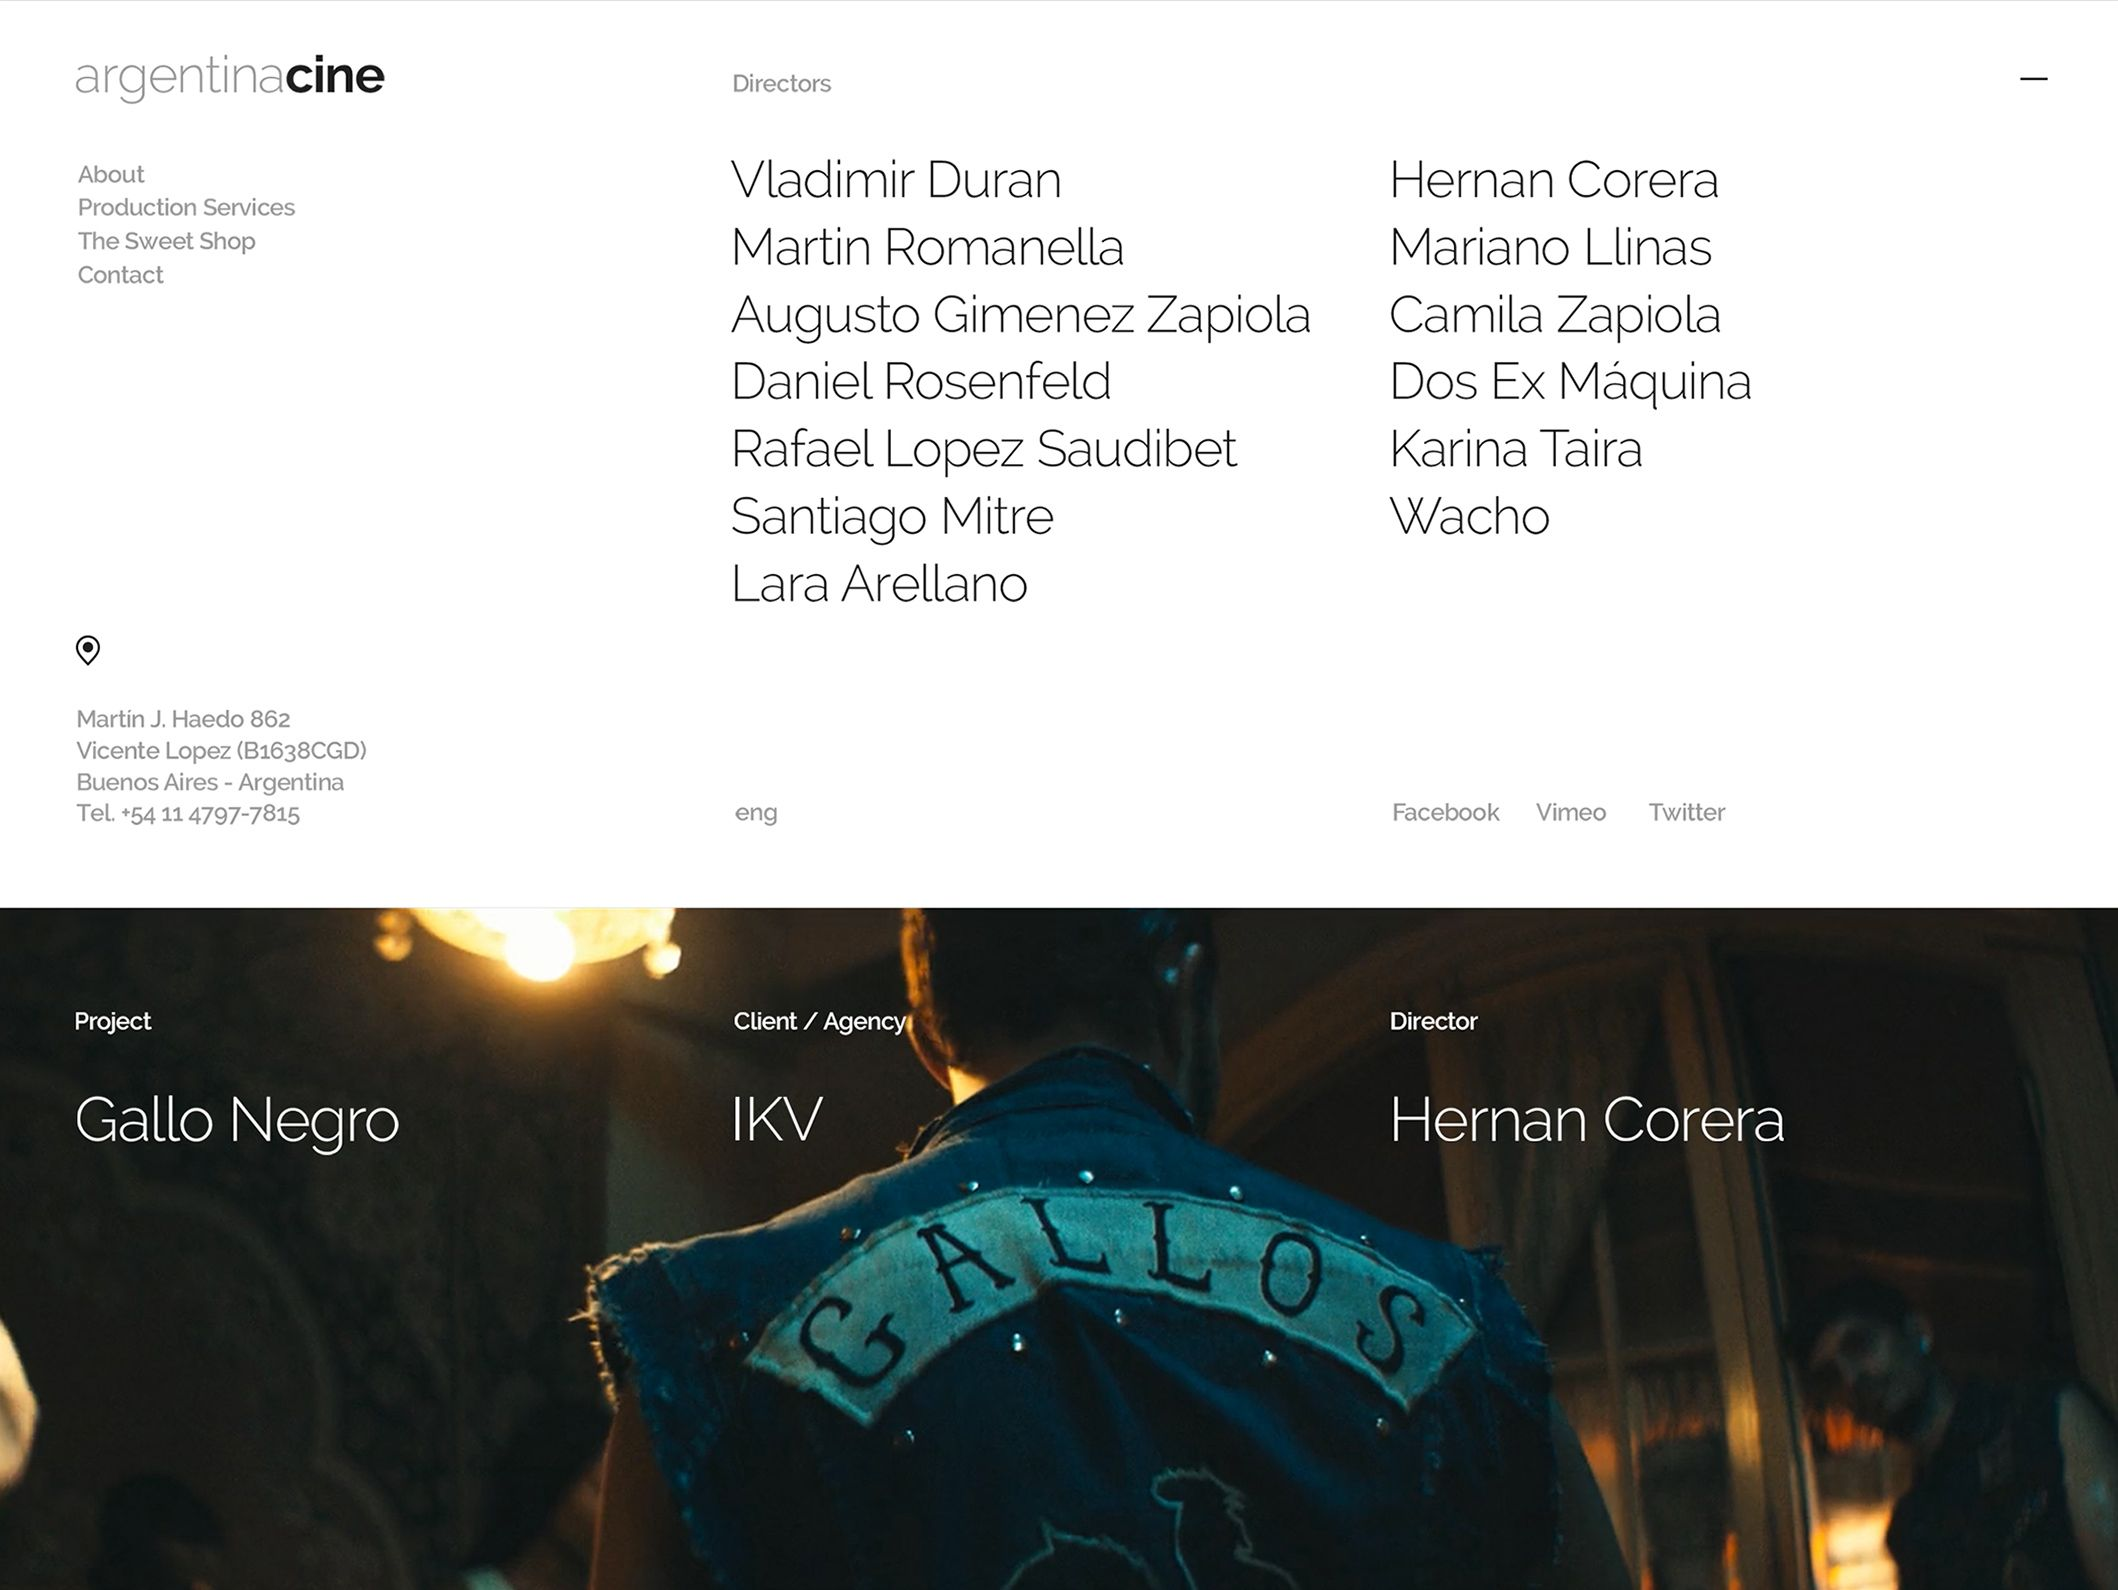 Argentina Cine - Digital Branding